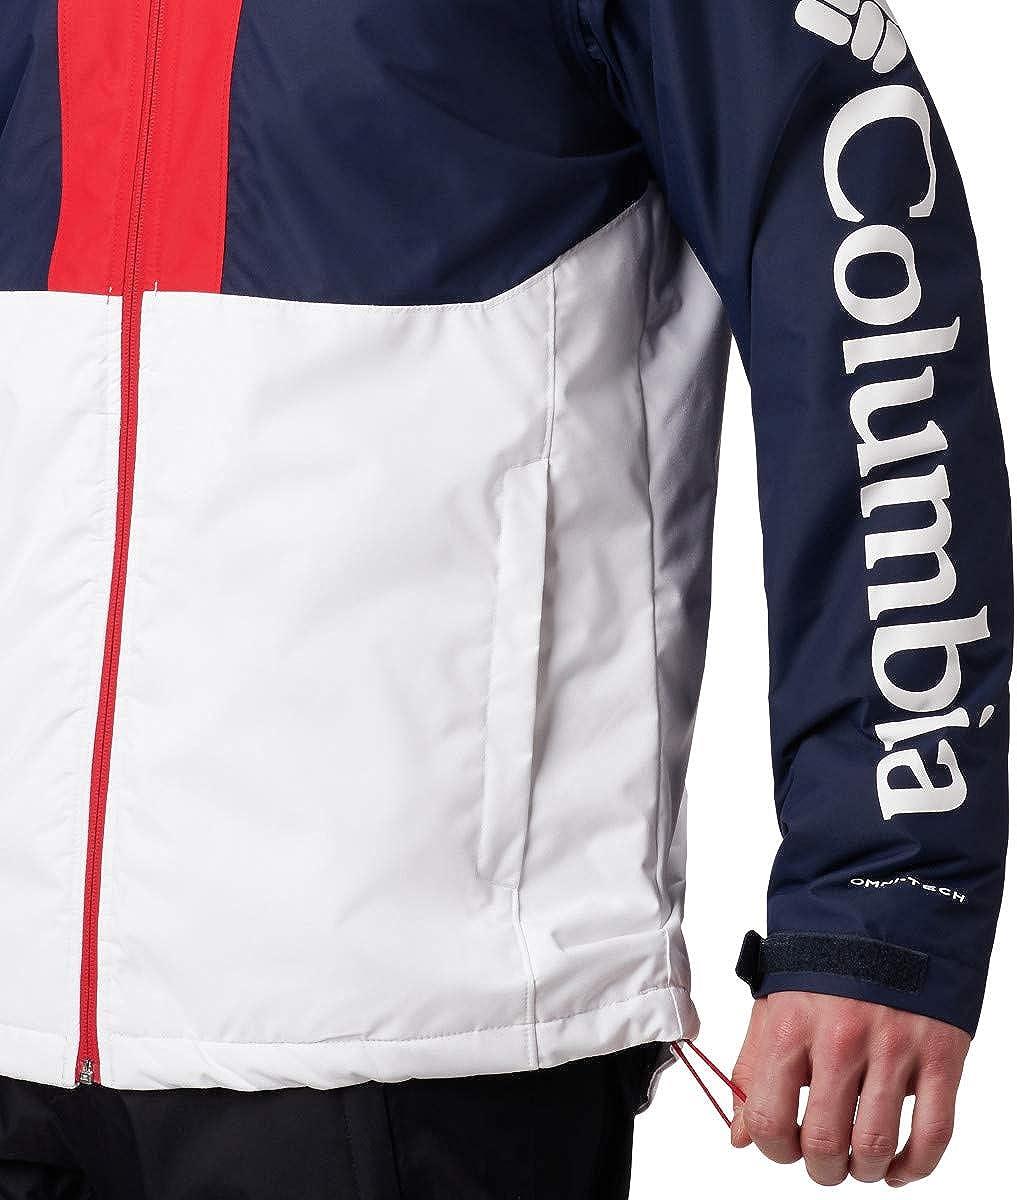 Columbia mens Timberturner Jacket